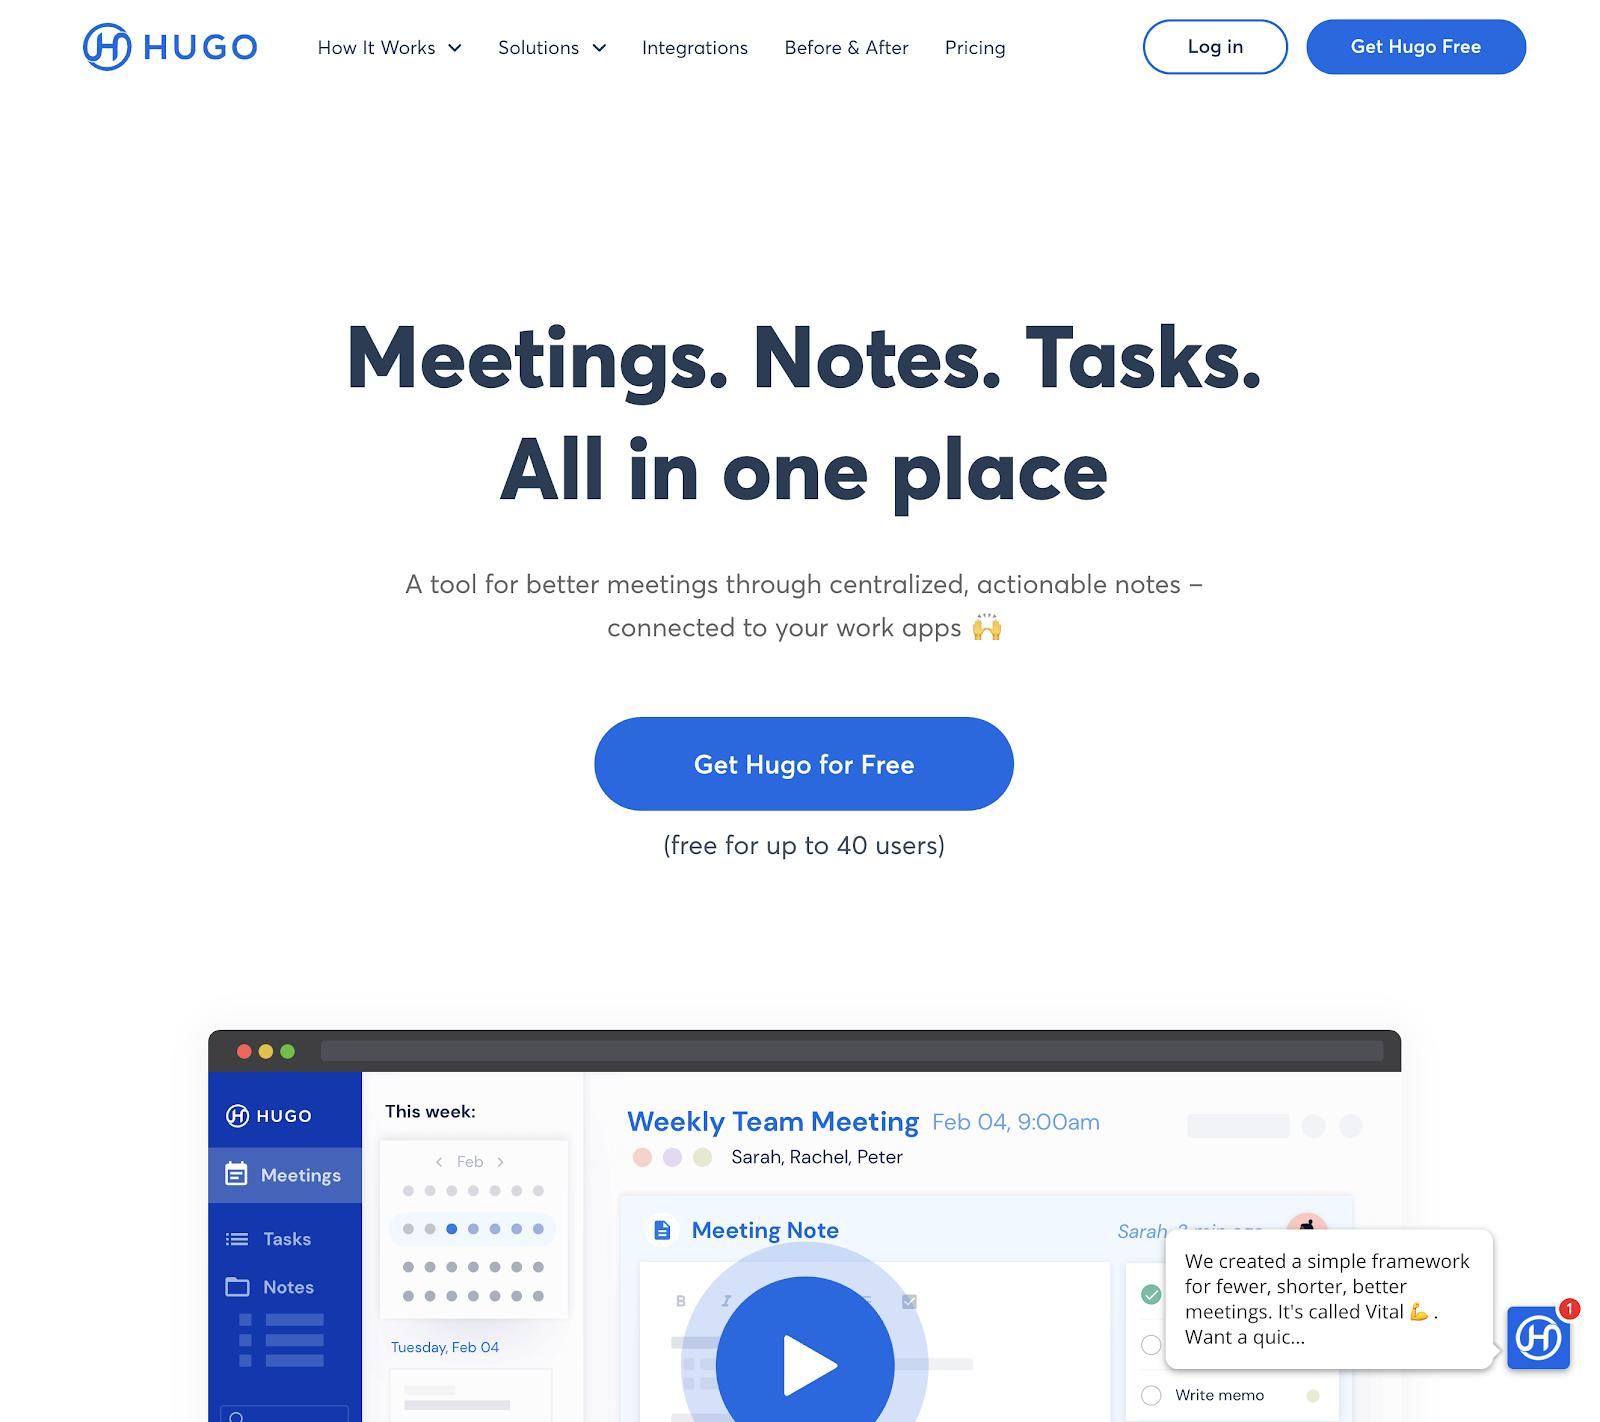 hugo website